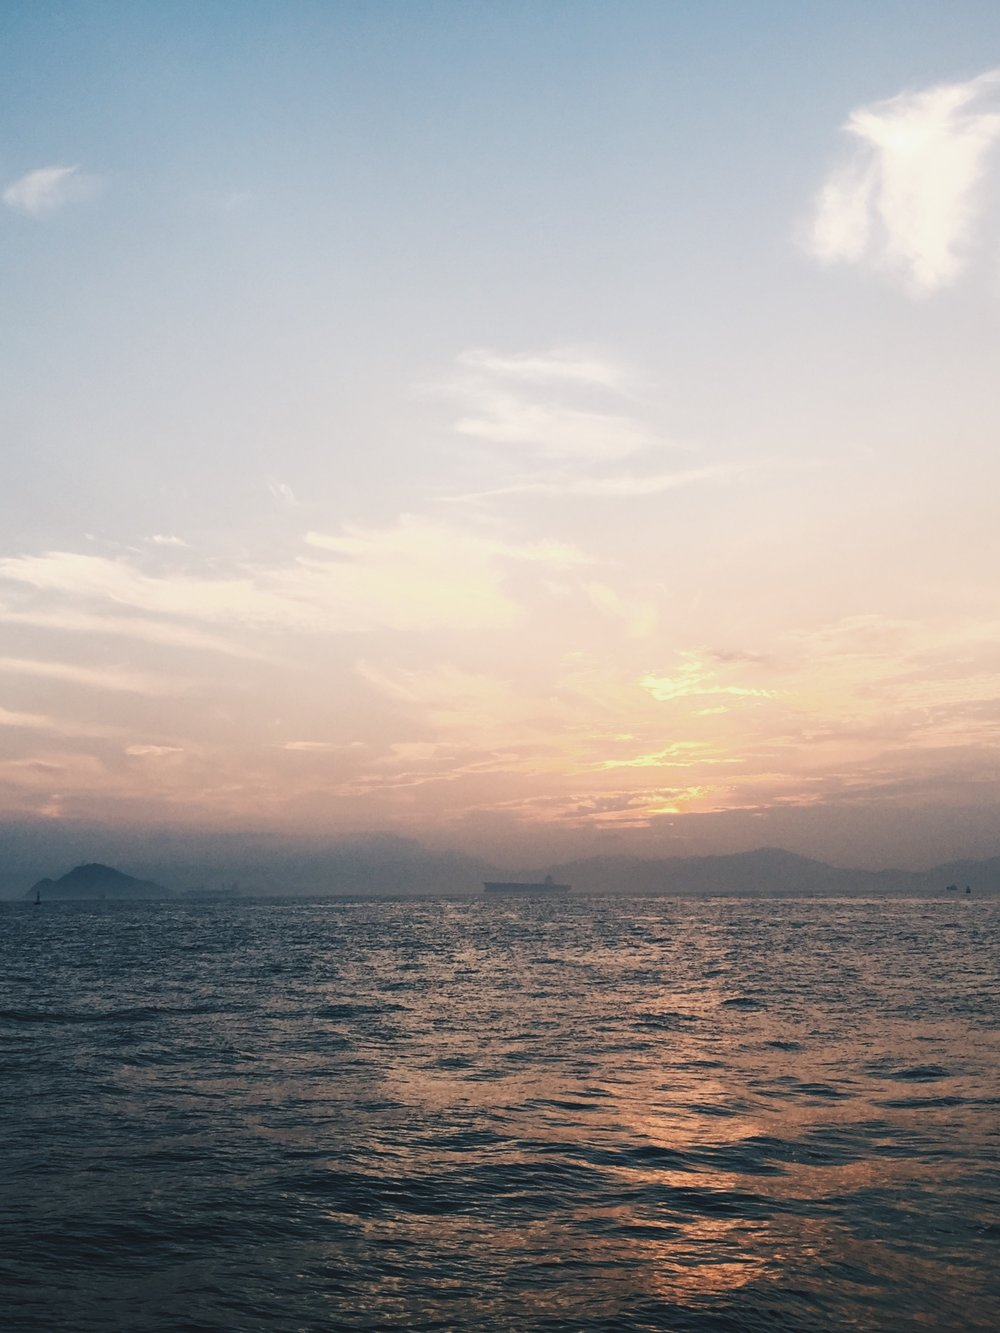 Sunset at Instagram Pier